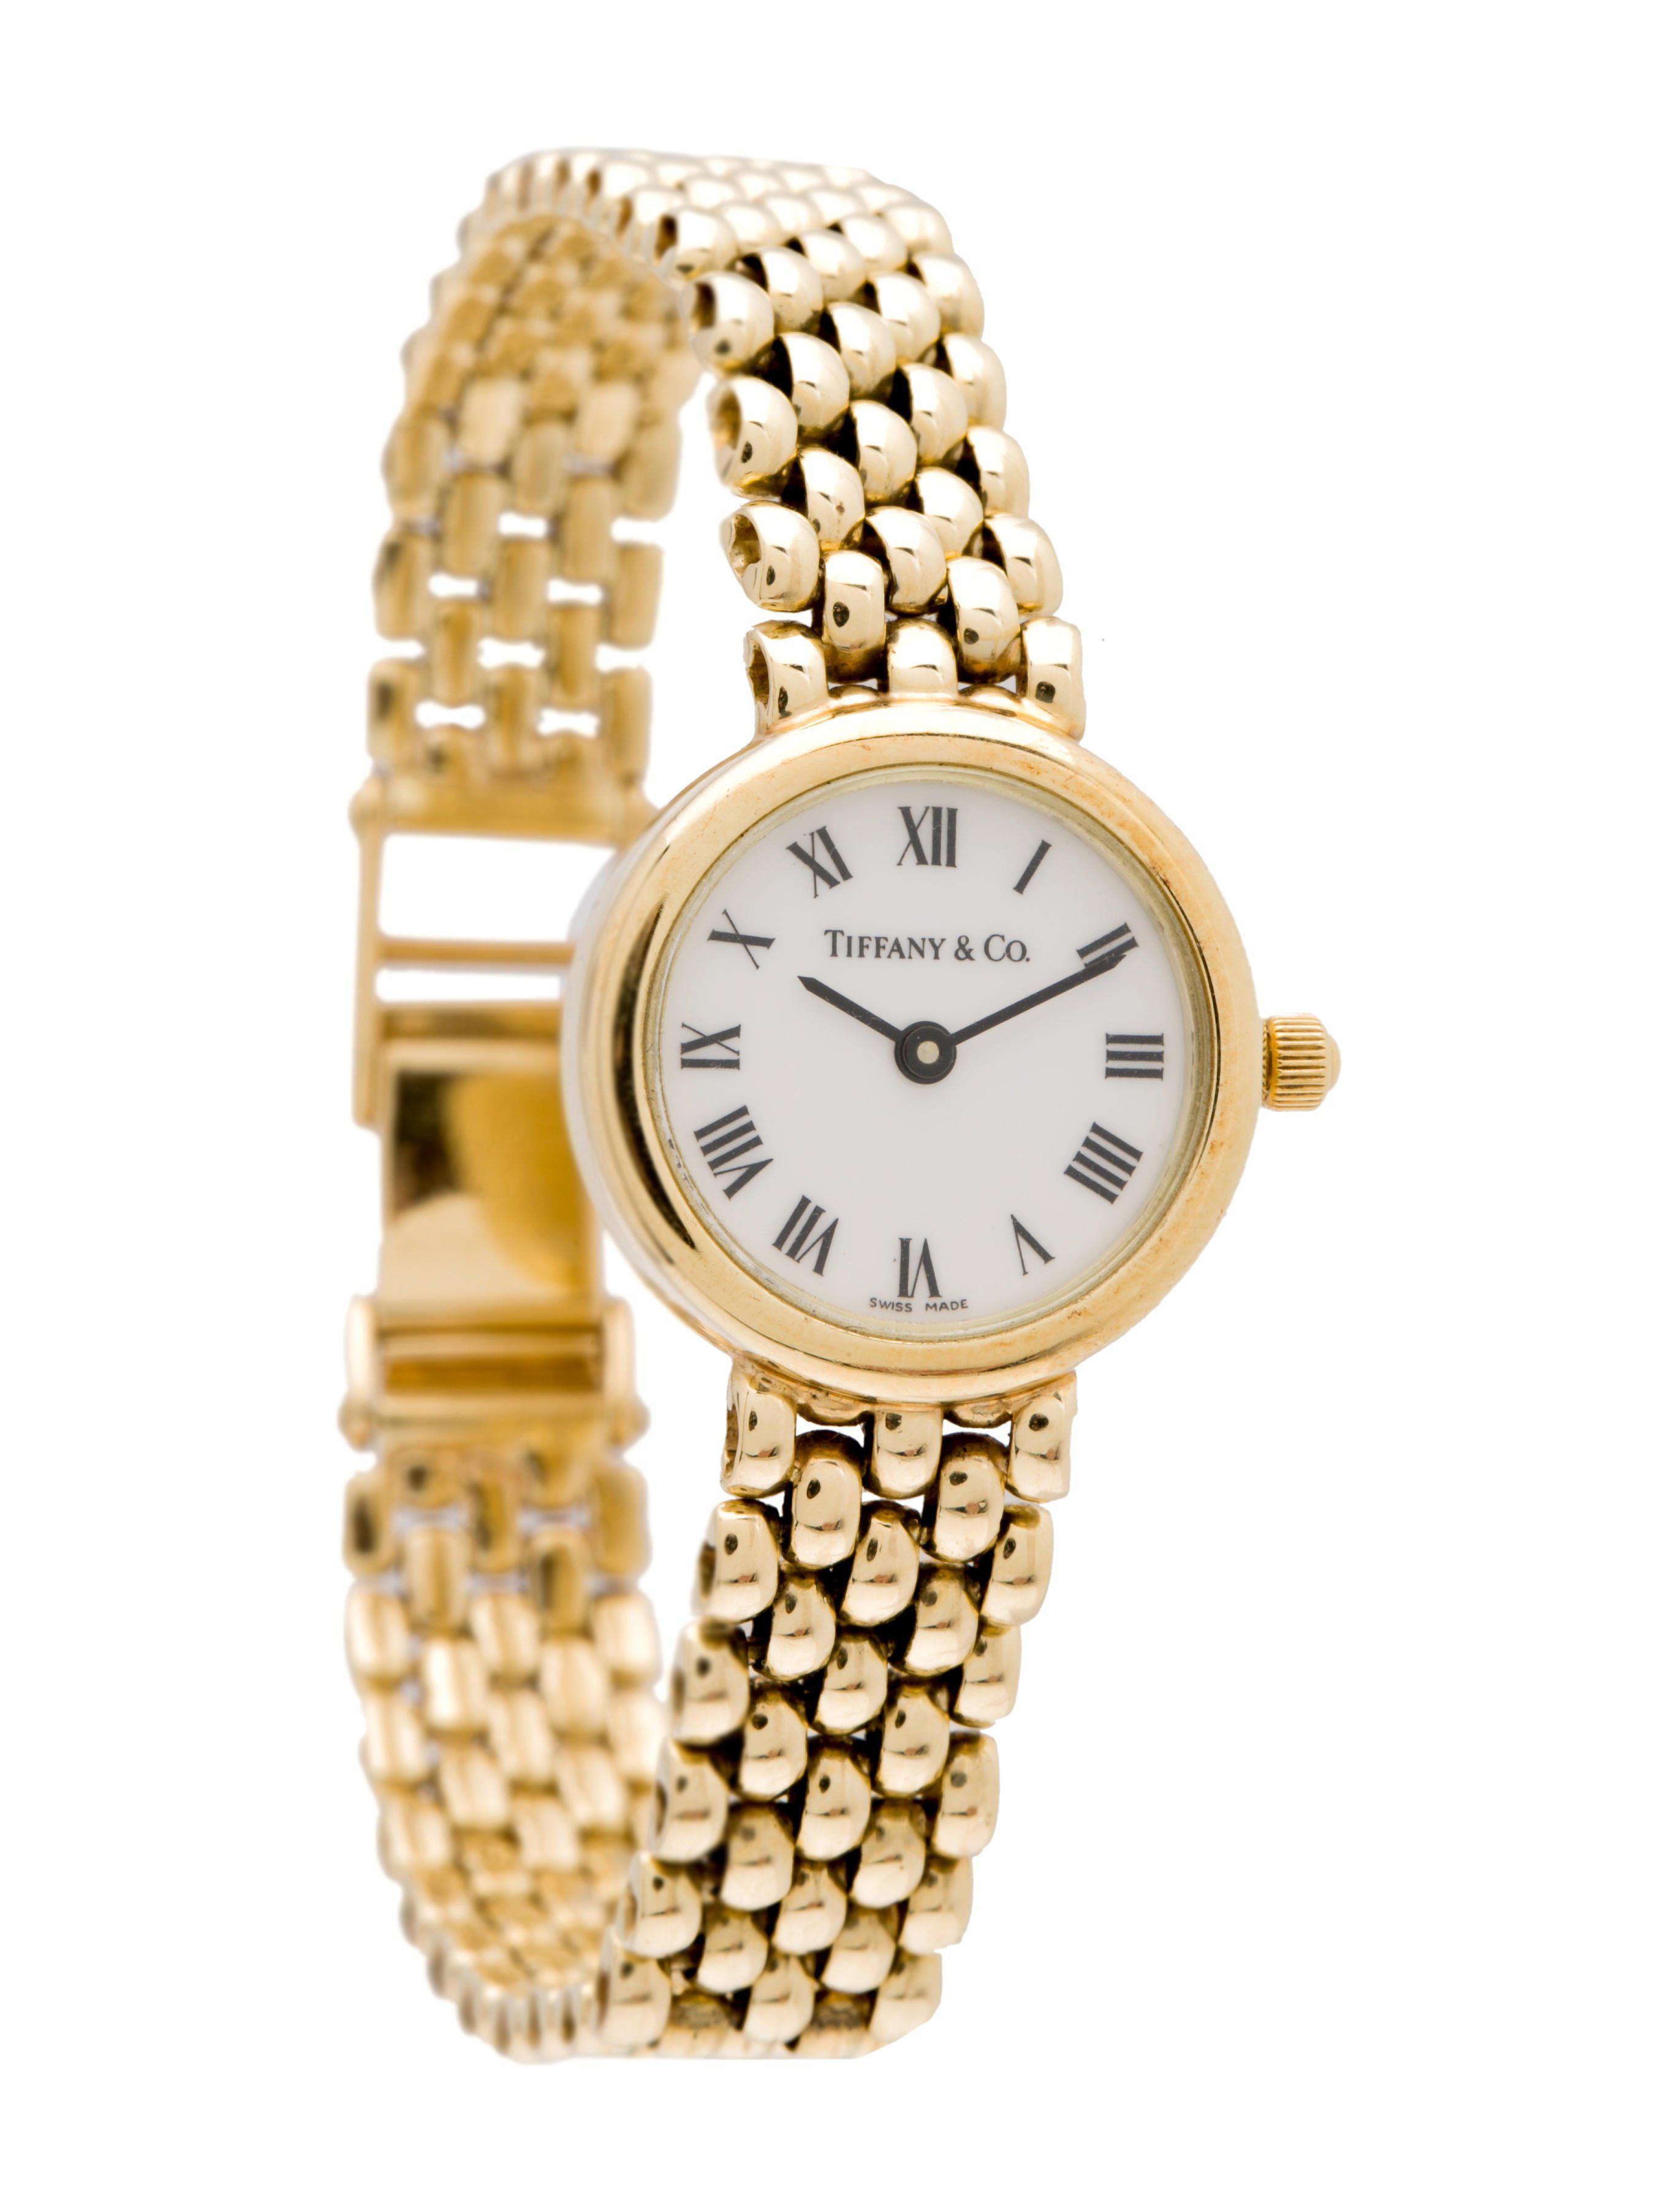 6b282d638f Lyst - Tiffany   Co Classic Watch Gold Tone in Metallic